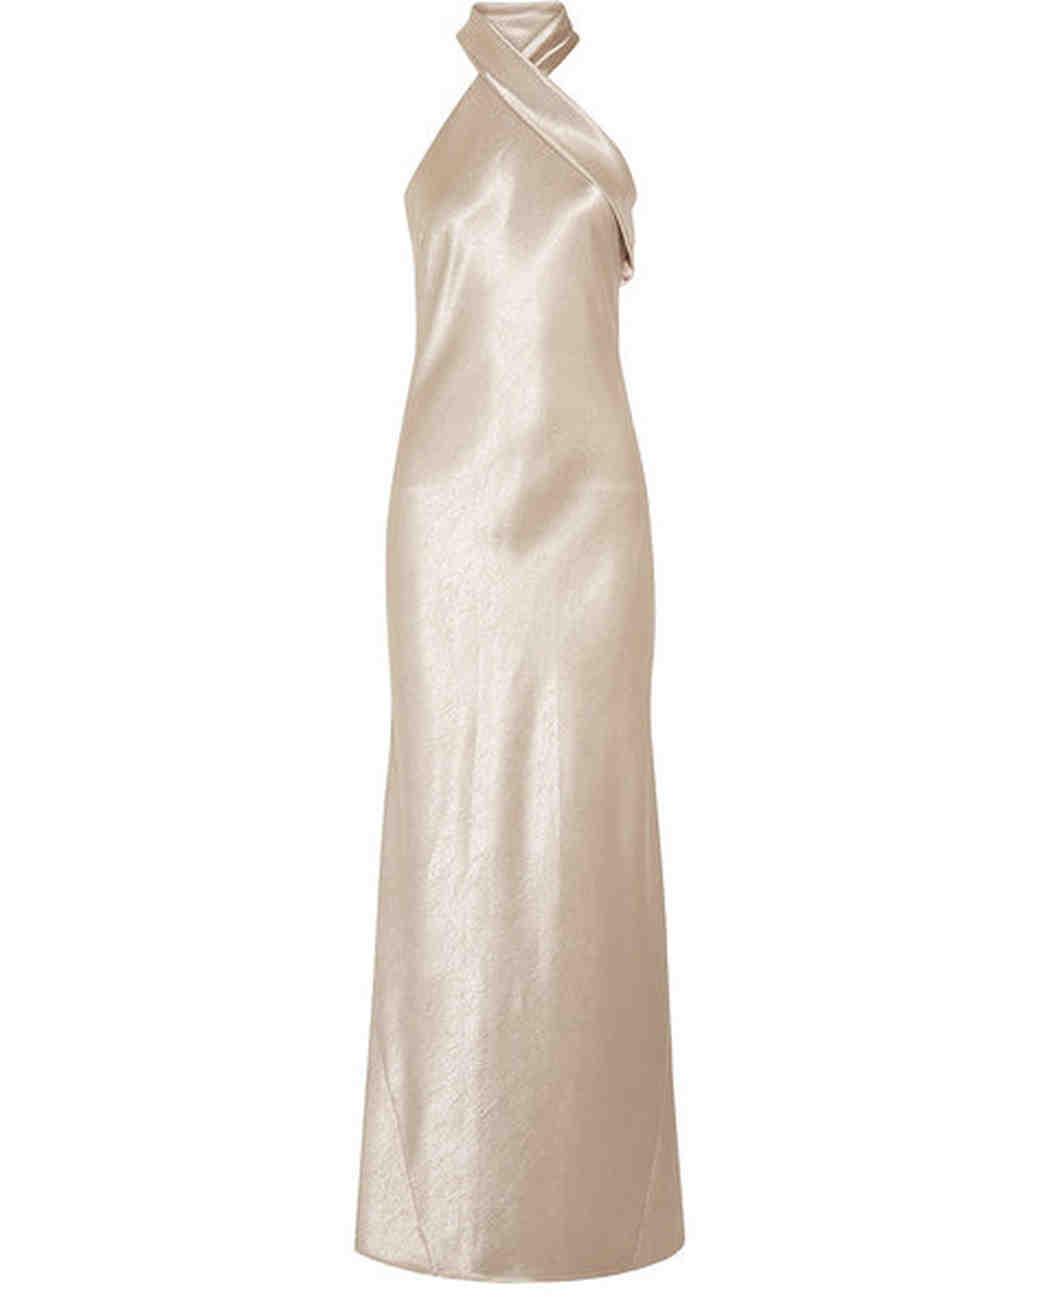 Mother-of-the-Bride Dresses That Aren\u0027t Matronly | Martha Stewart Weddings